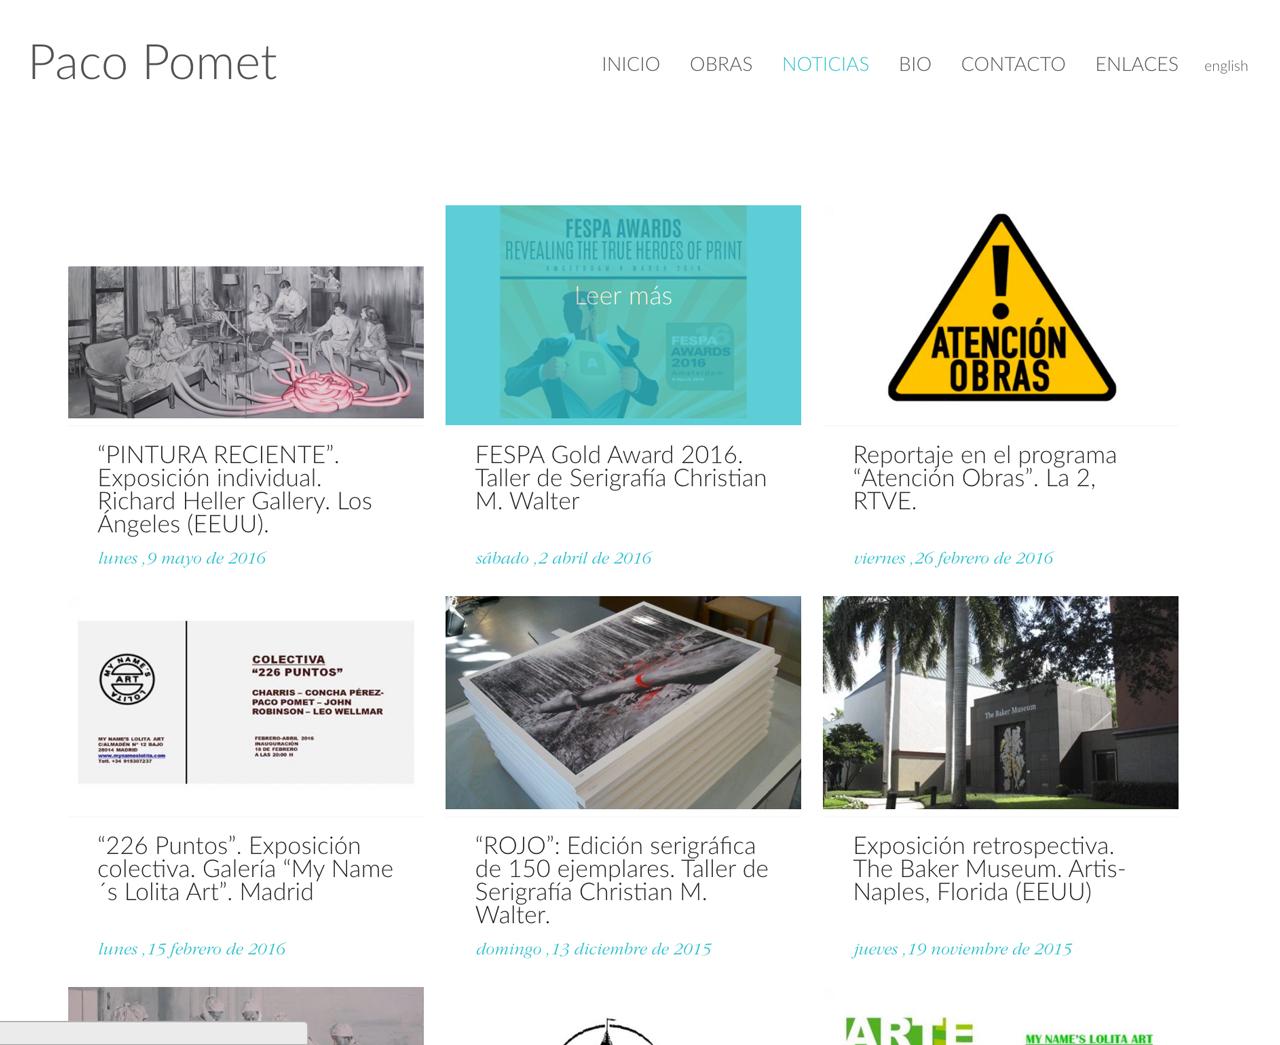 Paco-Pomet-website-diseno-granada-3